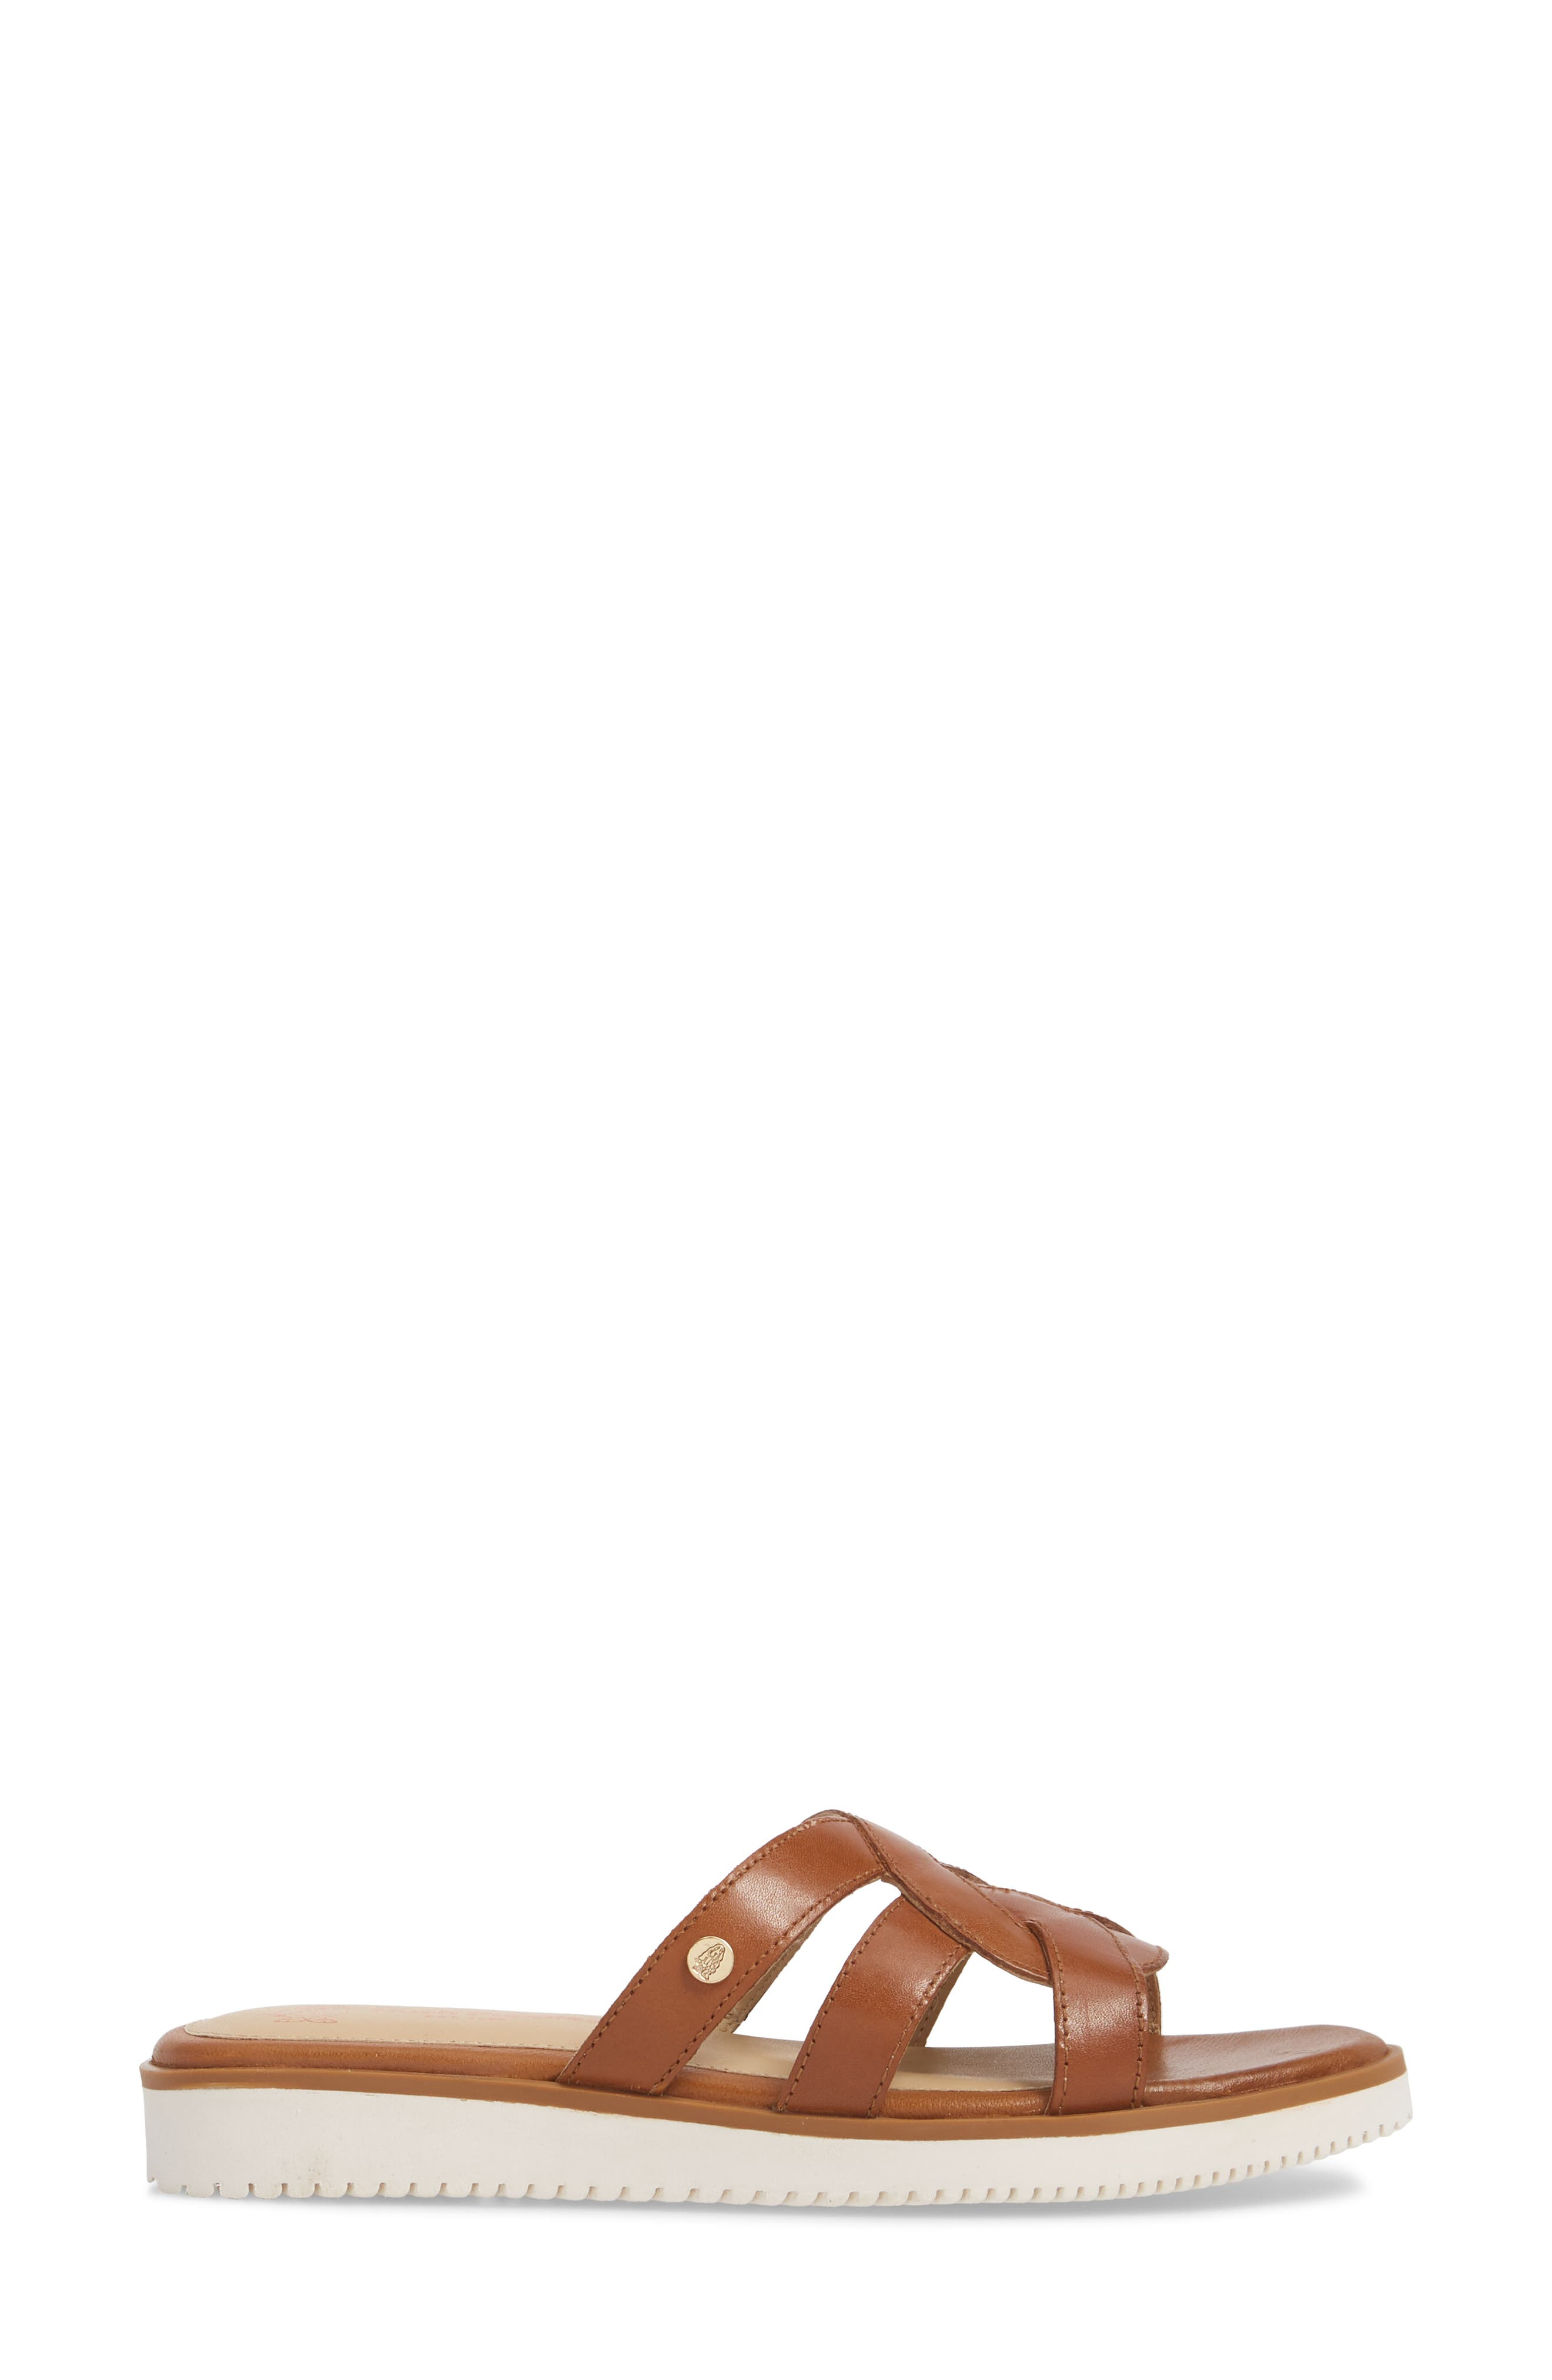 Braid Slide Sandal,                             Alternate thumbnail 3, color,                             Tan Leather